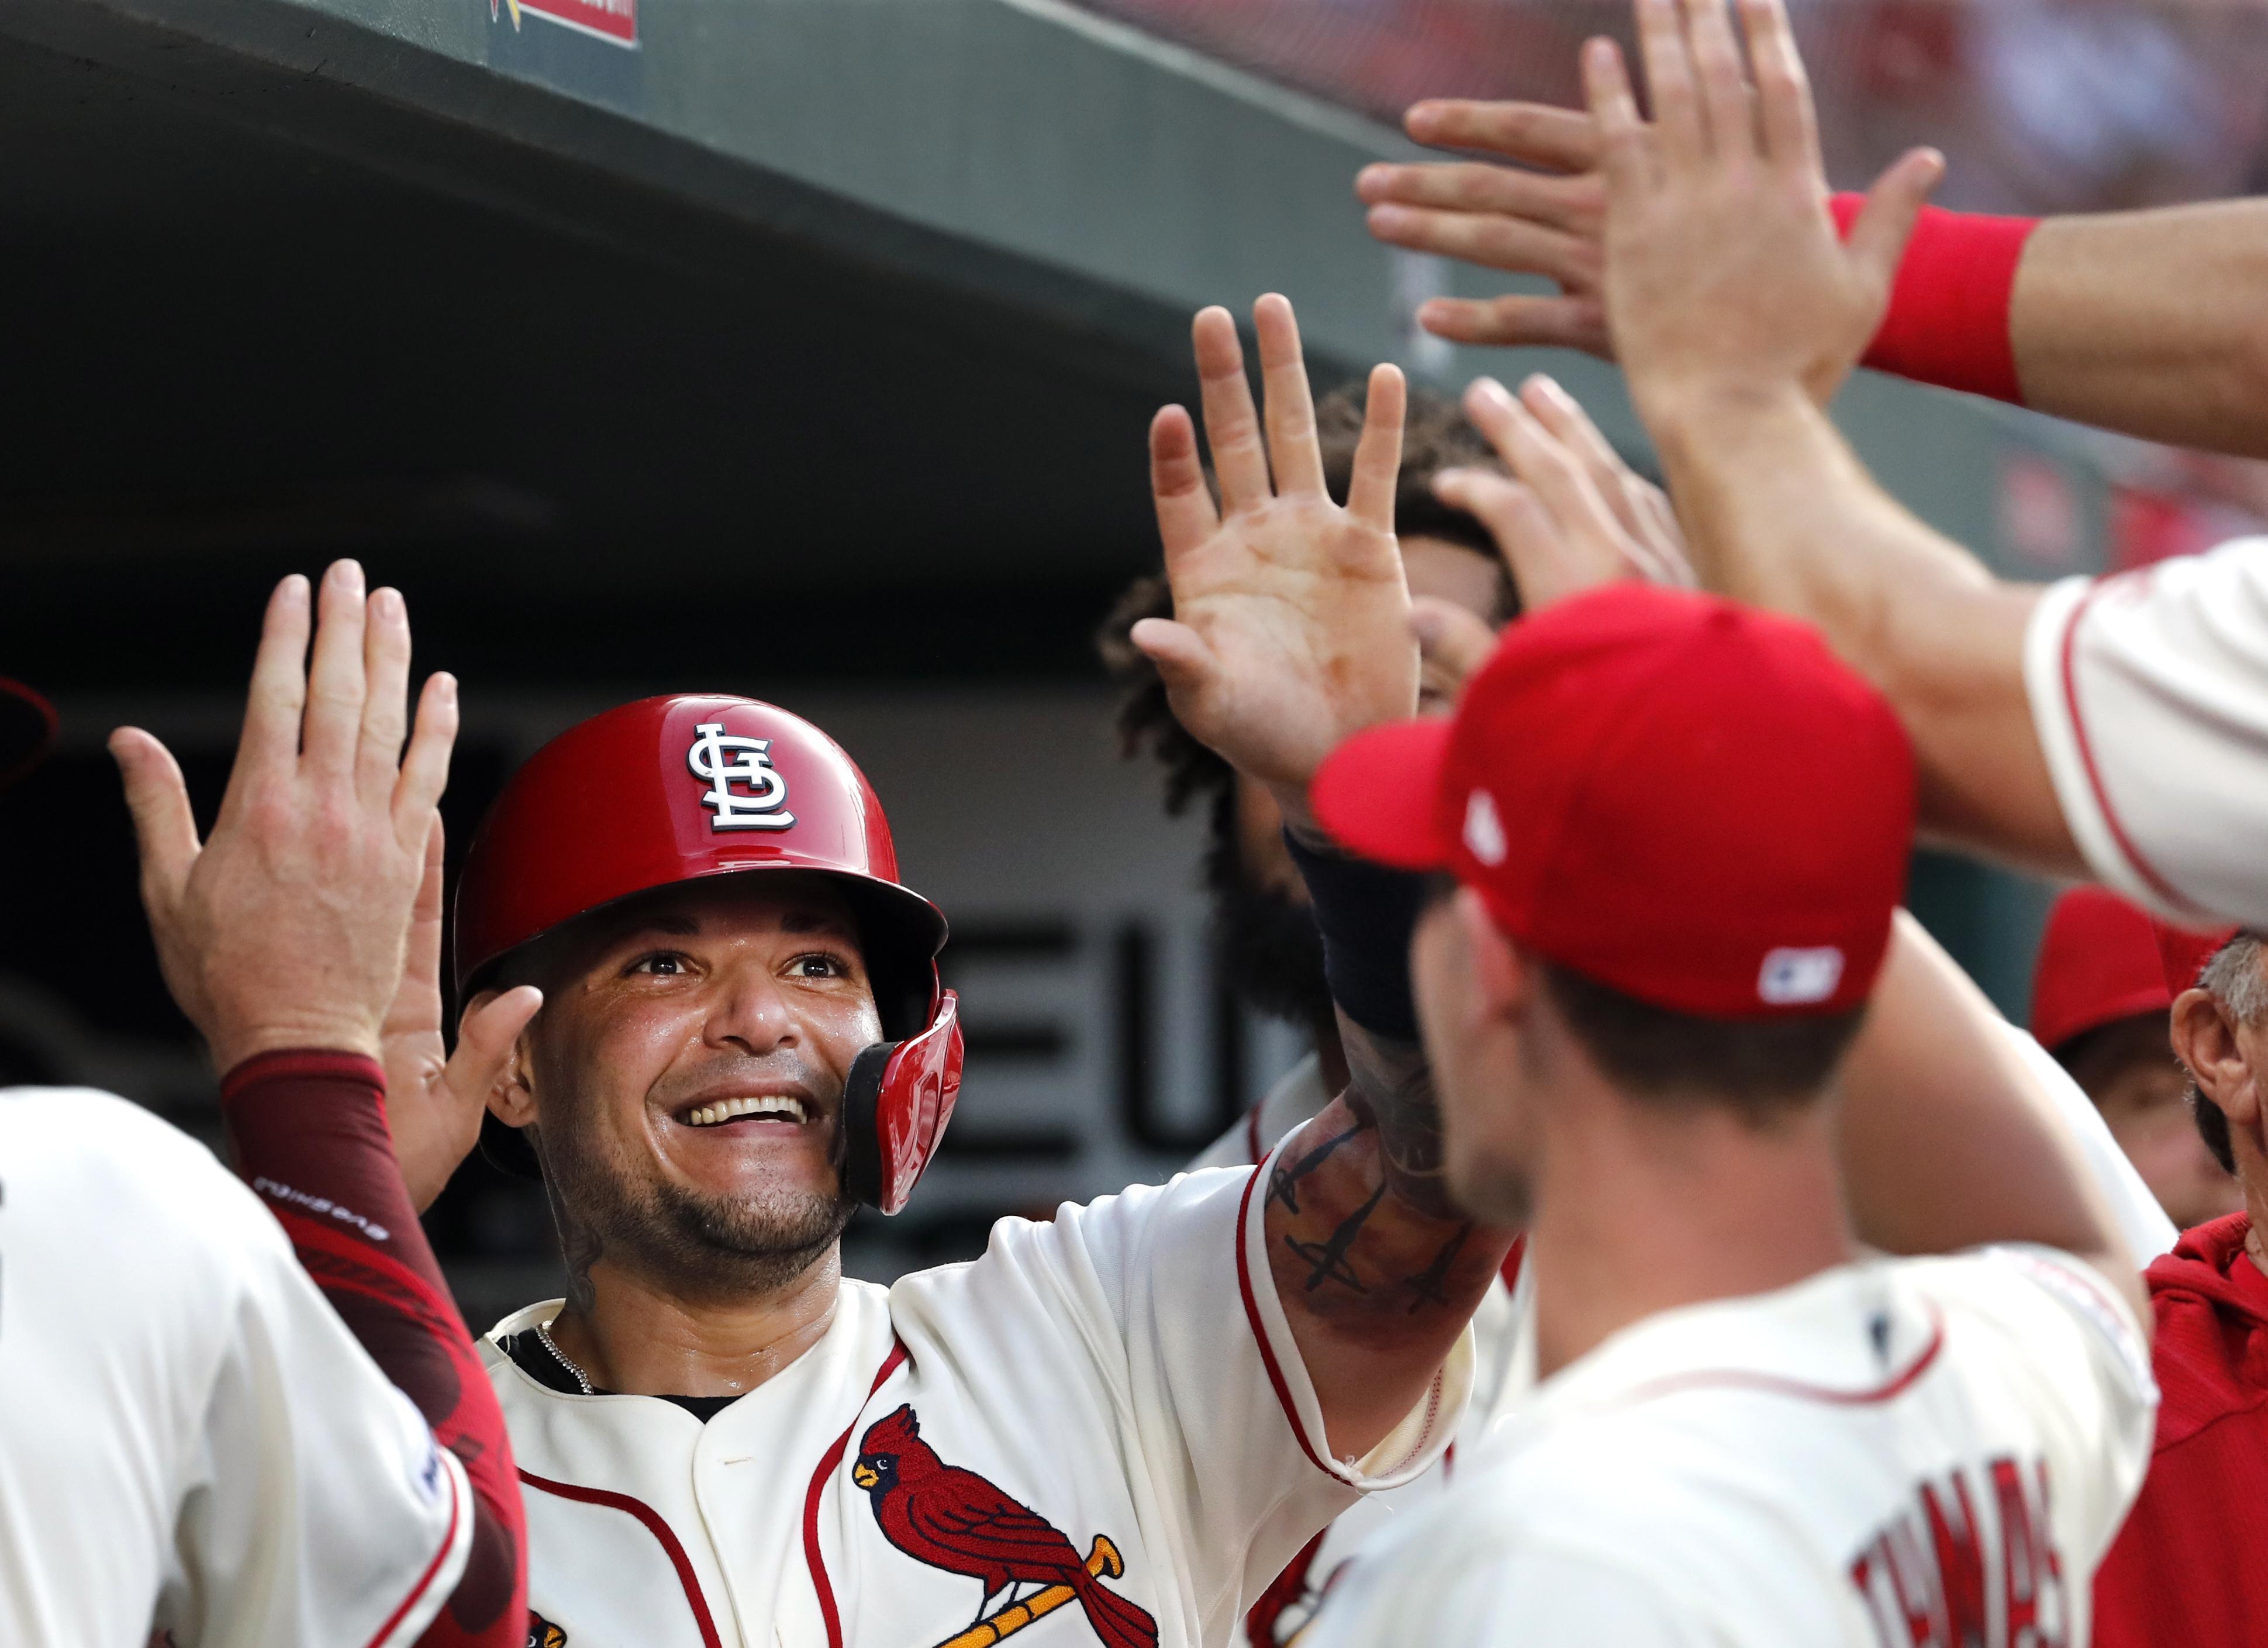 Cardinals activate Yadier Molina, put Jose Martinez on